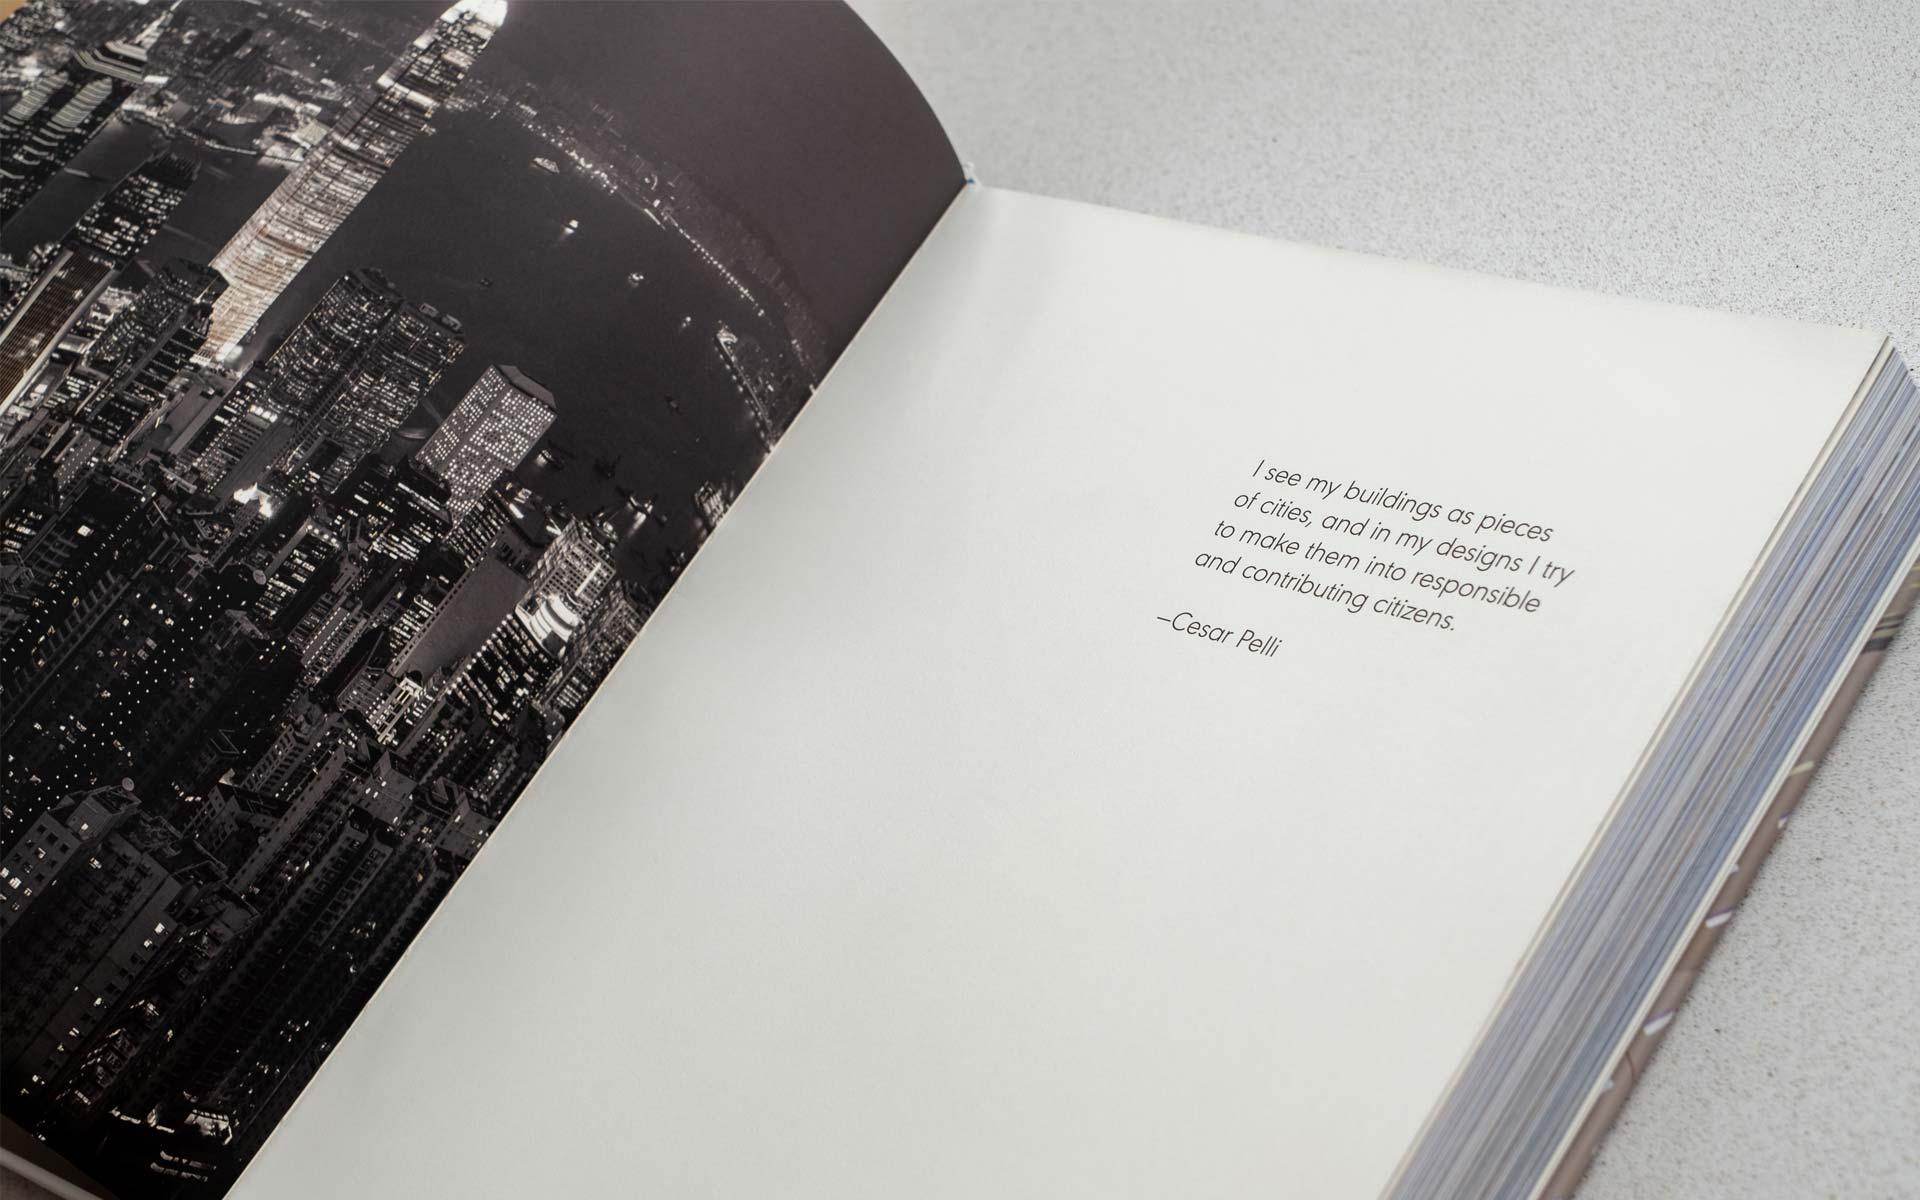 pelli-life-in-architecture-book-4